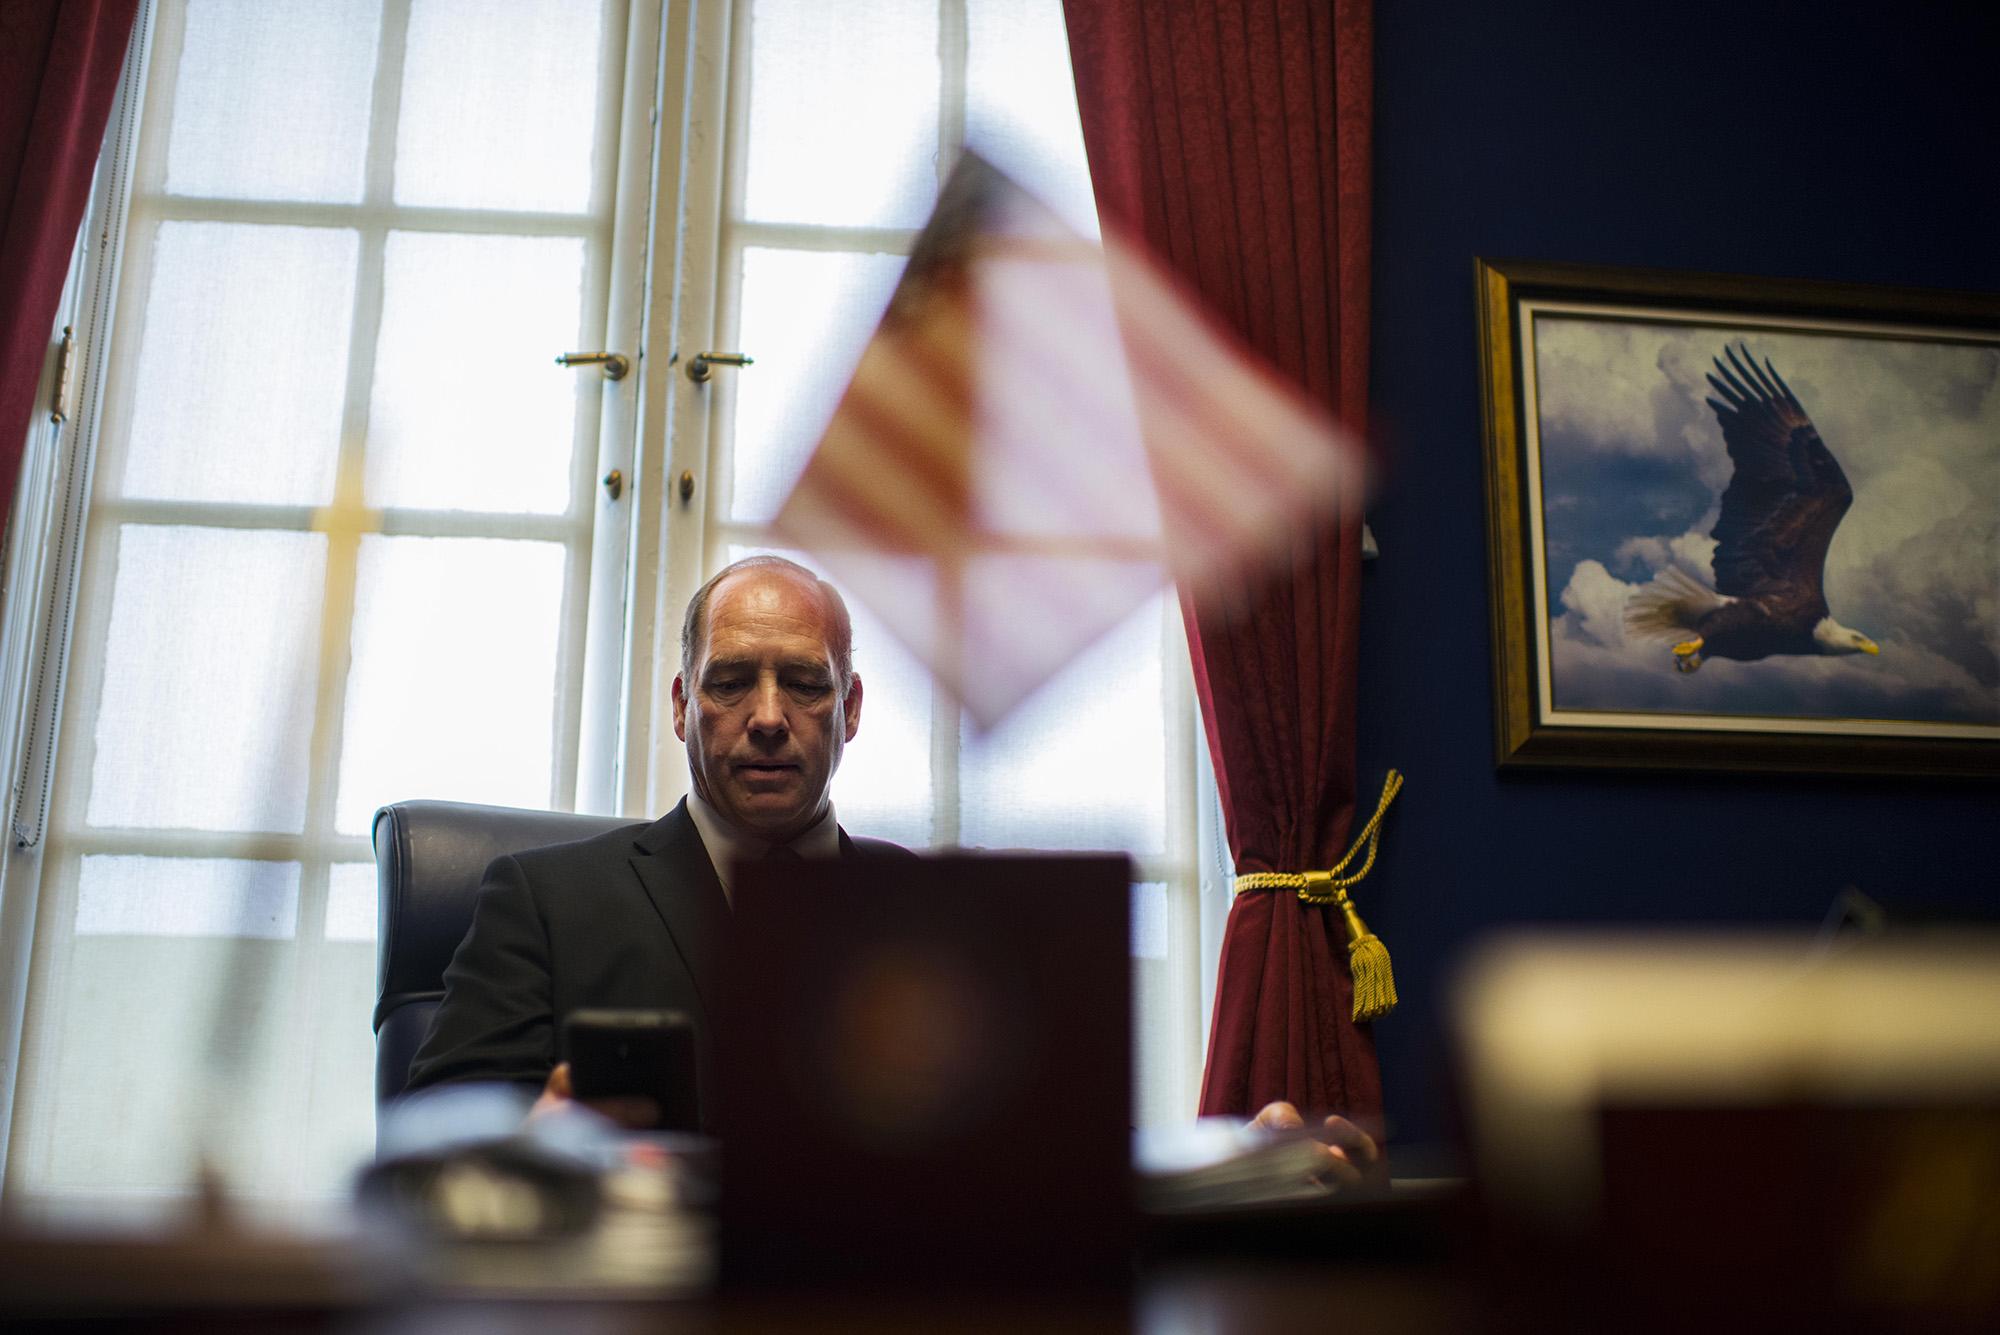 Ted Yoho (fotó: Melina Mara/The Washington Post via Getty Images)